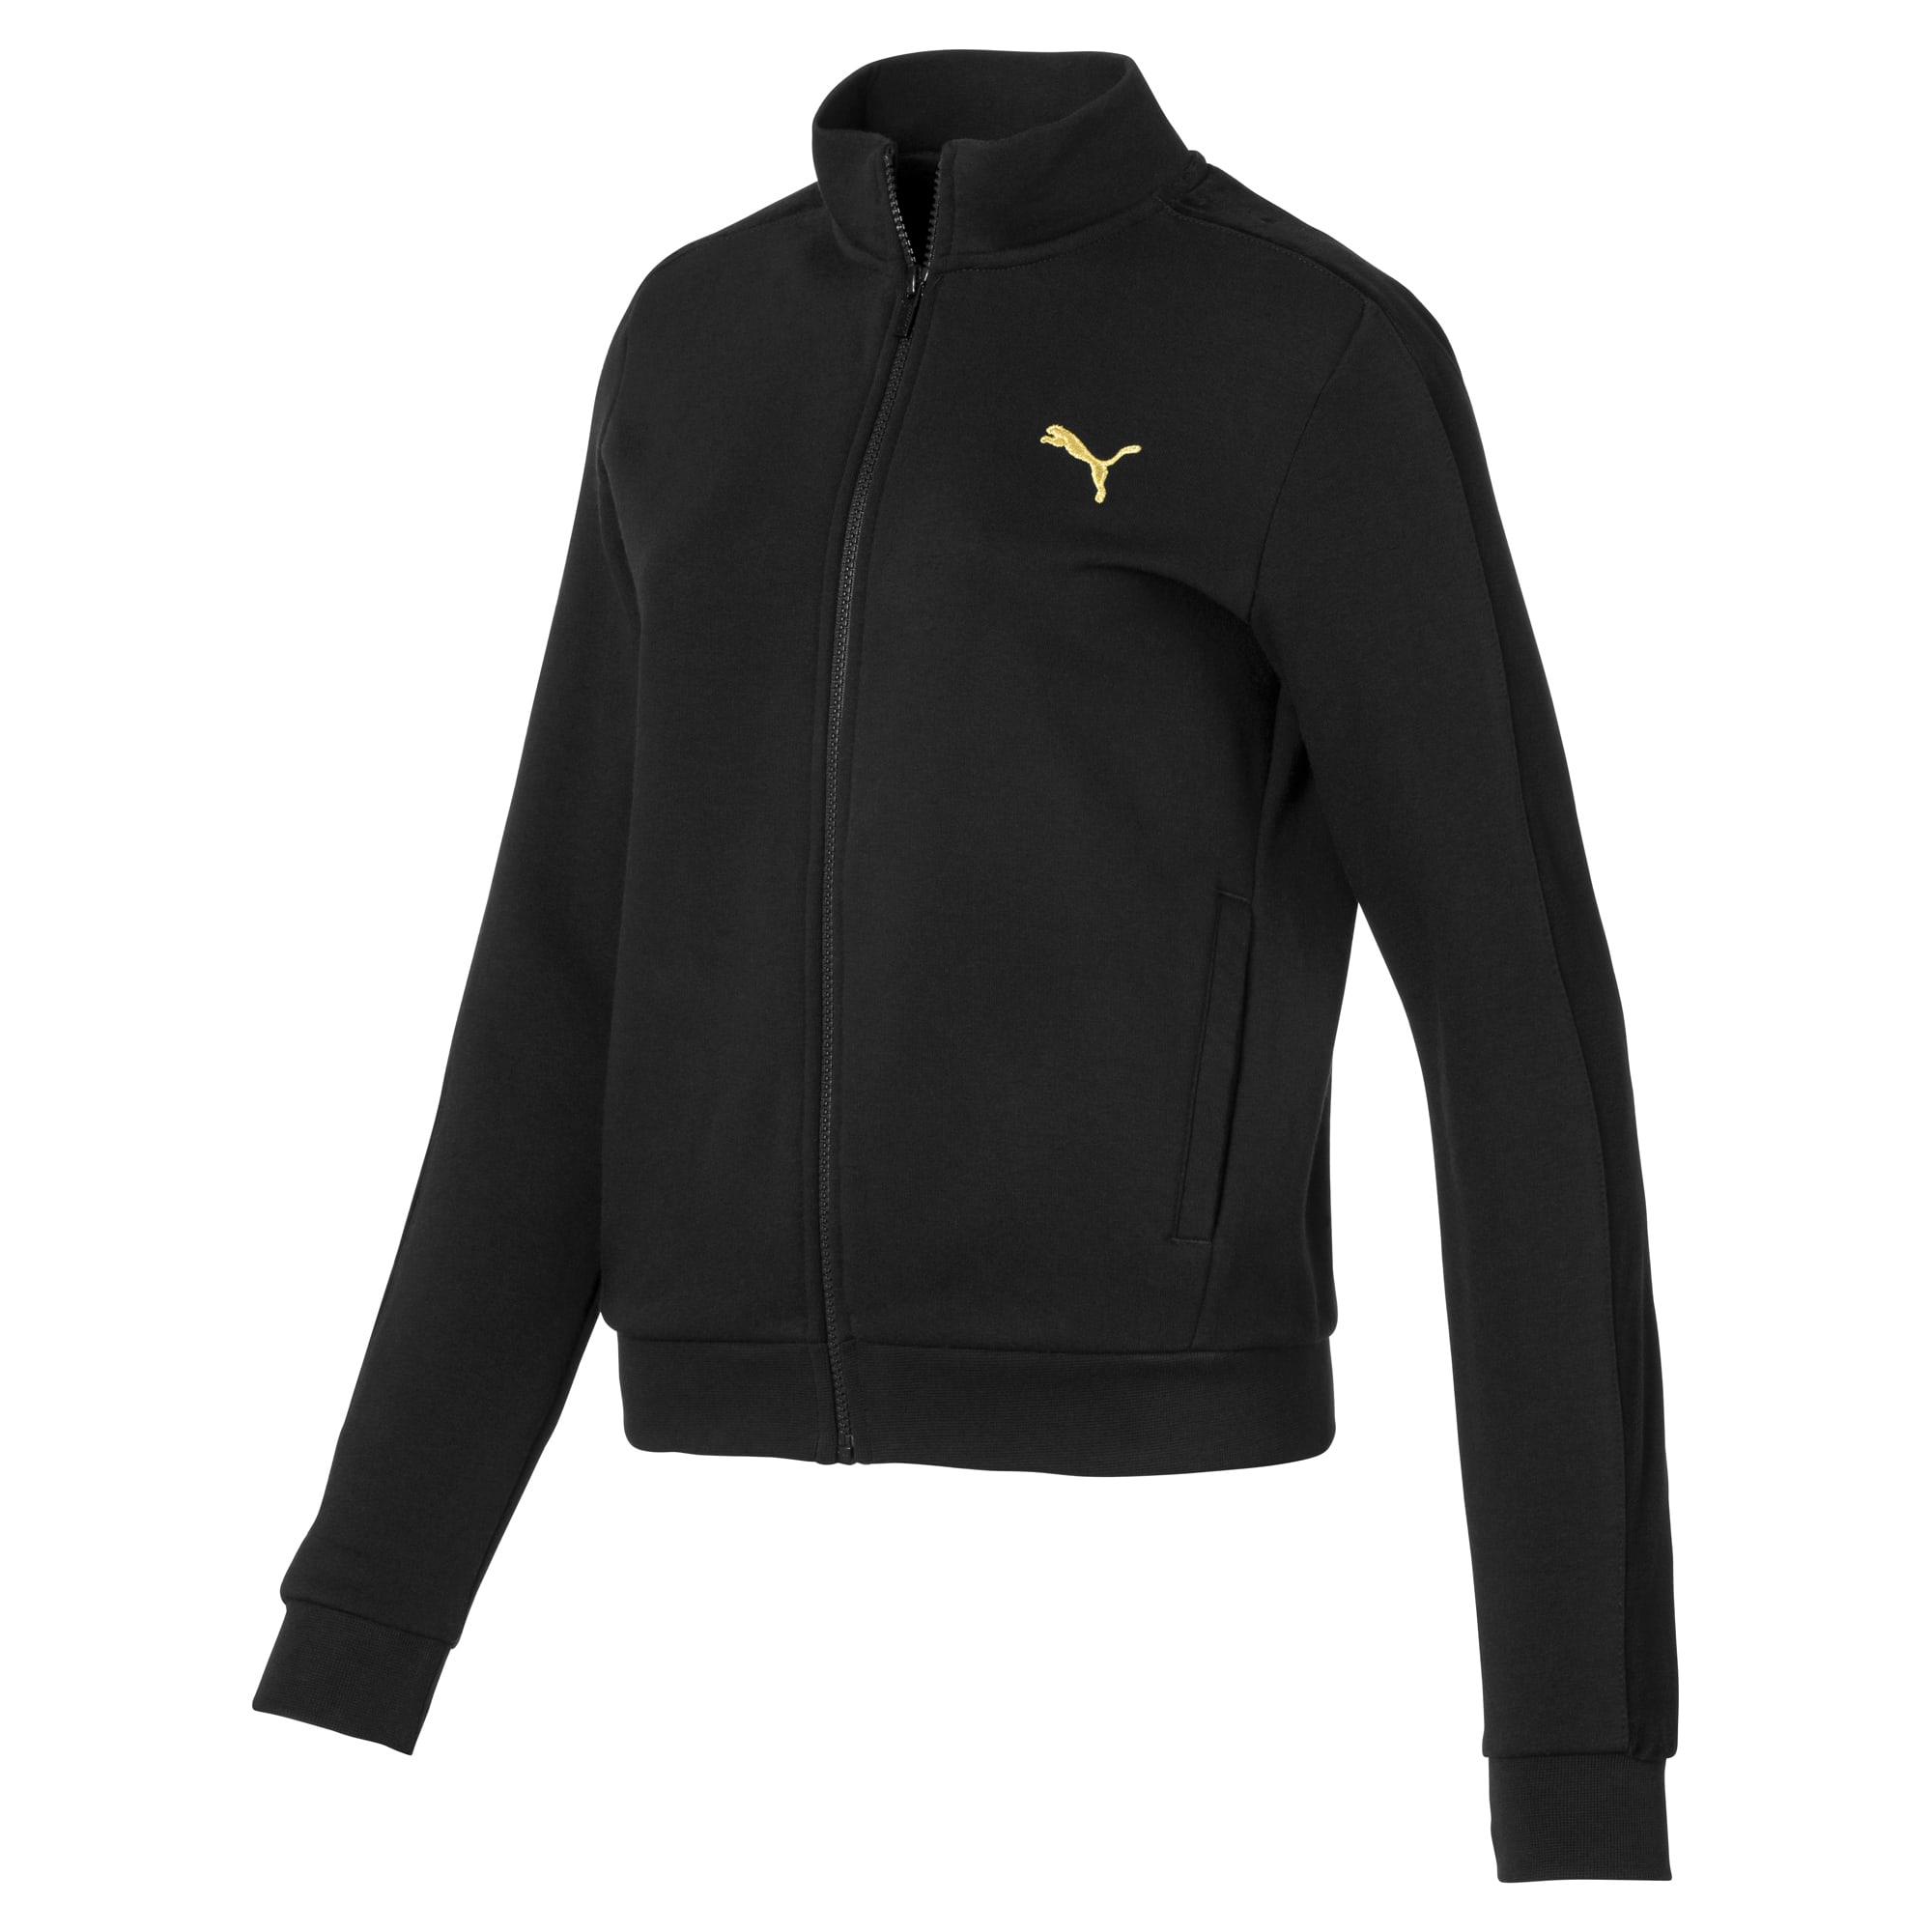 puma -  Damen Fleece Trainingsjacke | Mit Aucun | Schwarz | Größe: XS